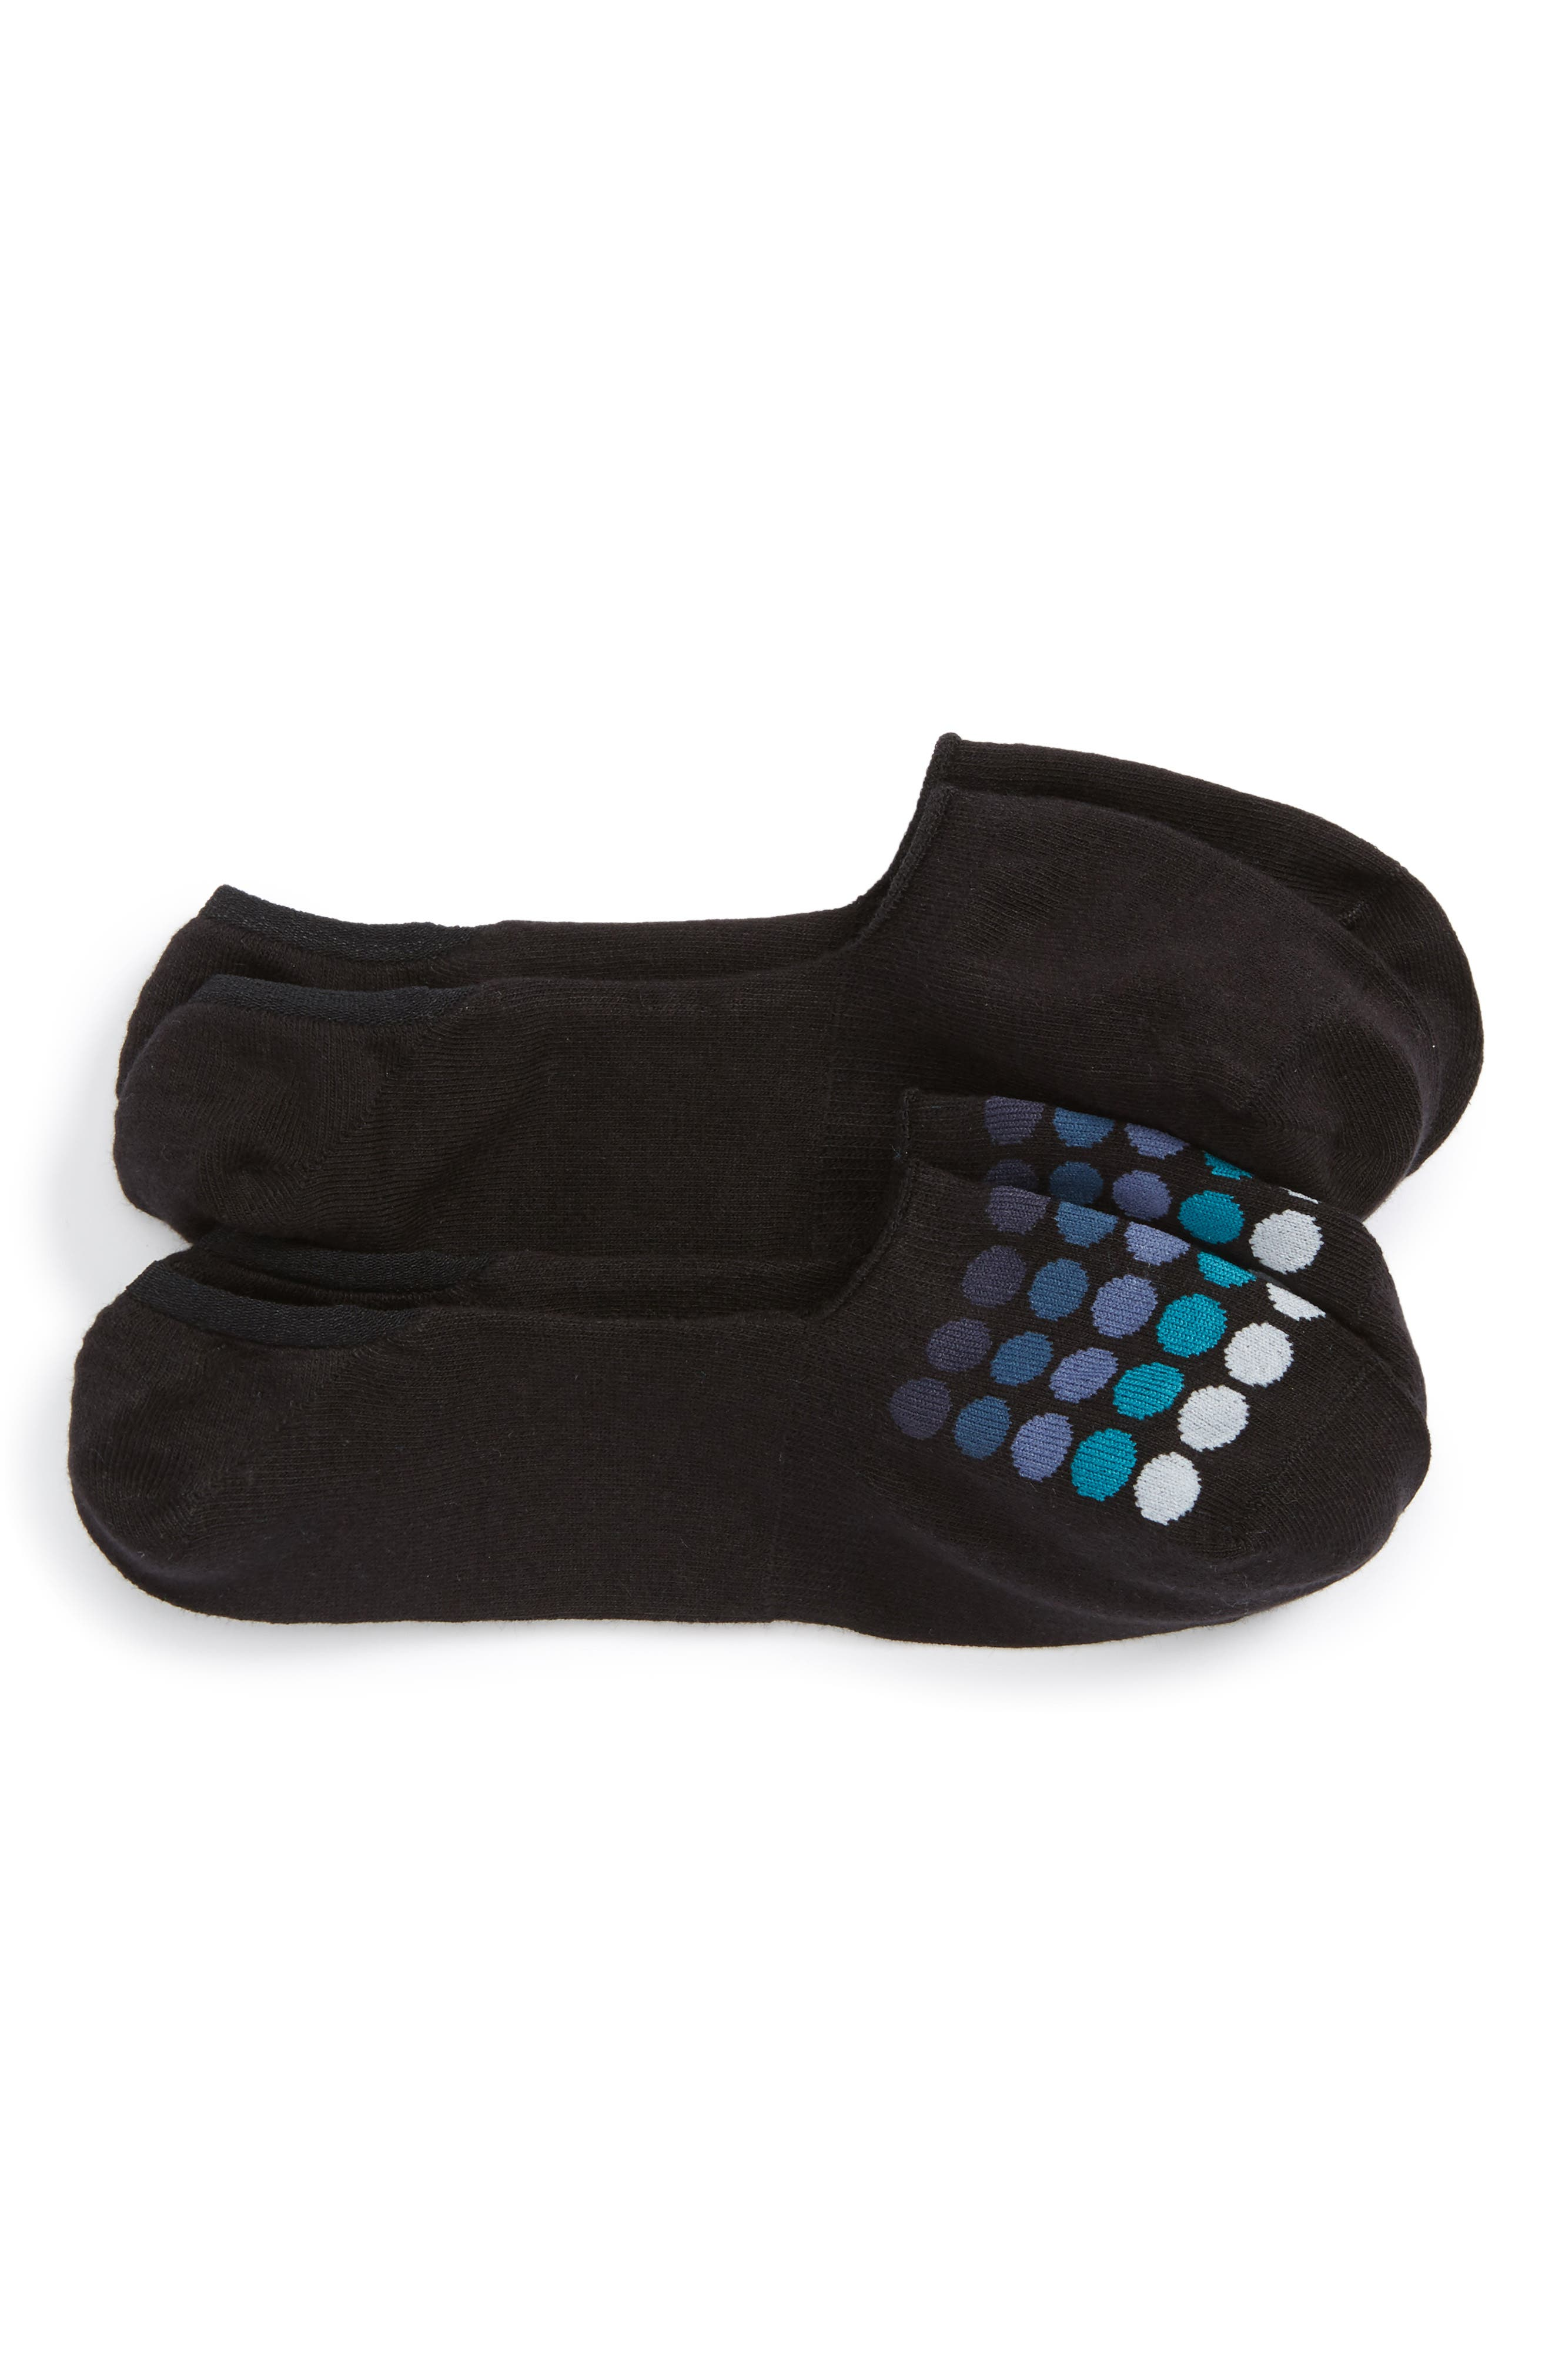 2-Pack Cotton Blend Liner Socks,                             Main thumbnail 1, color,                             001